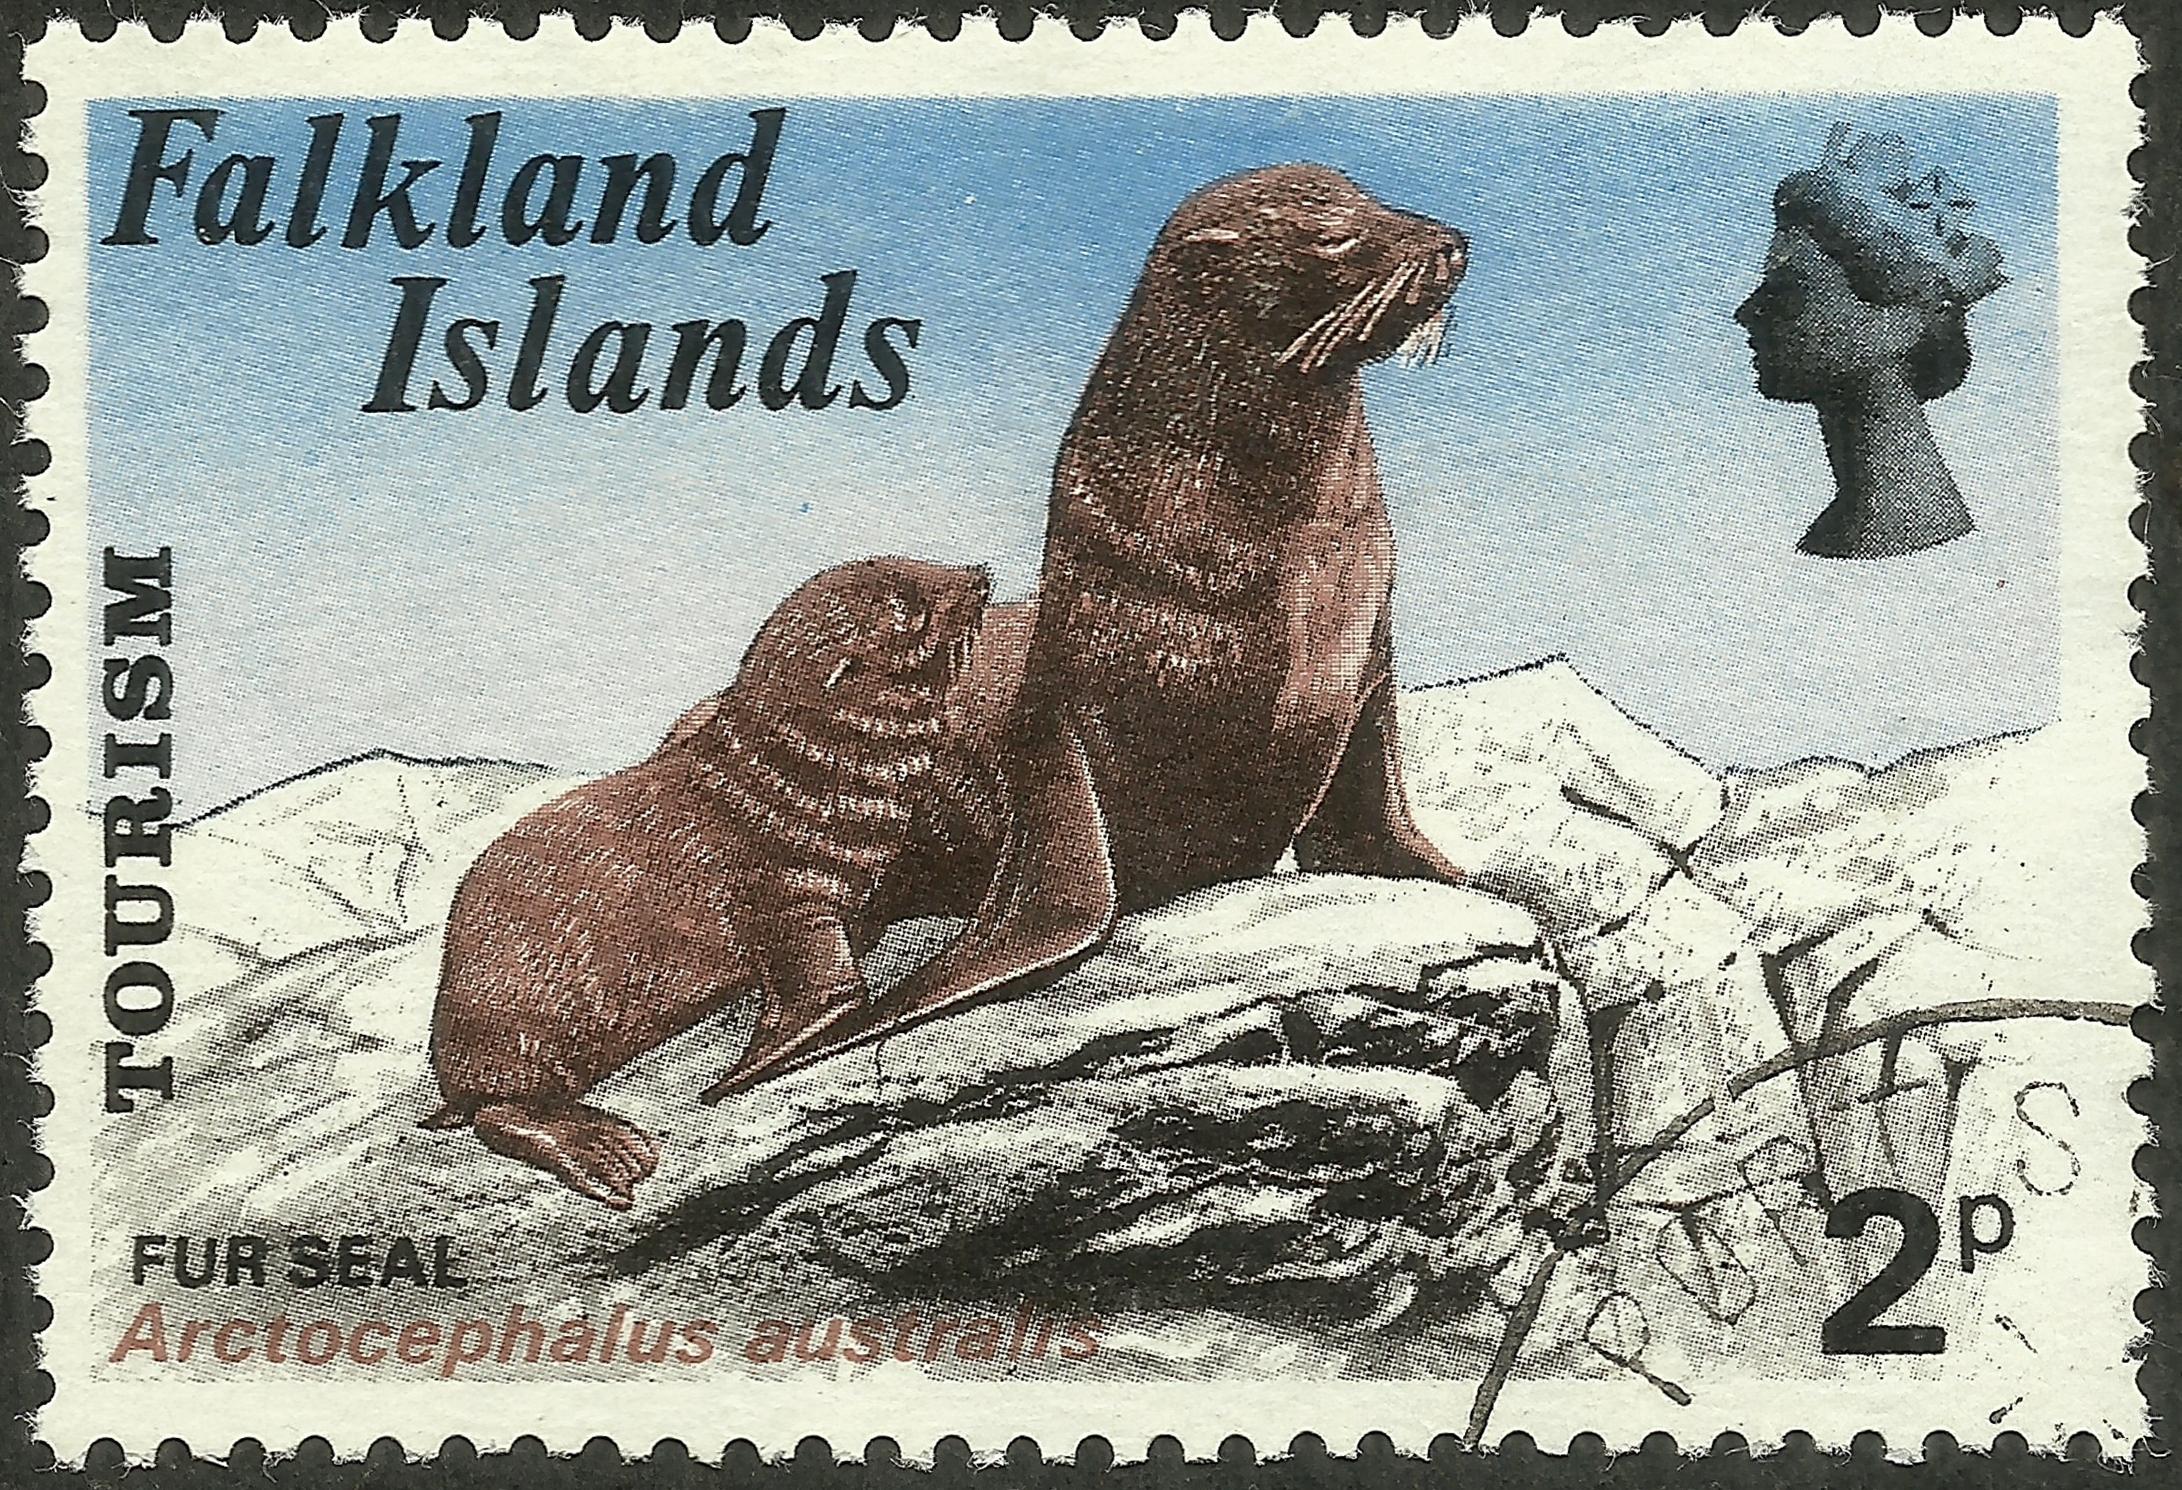 Falkland Islands - Scott #227 (1974)